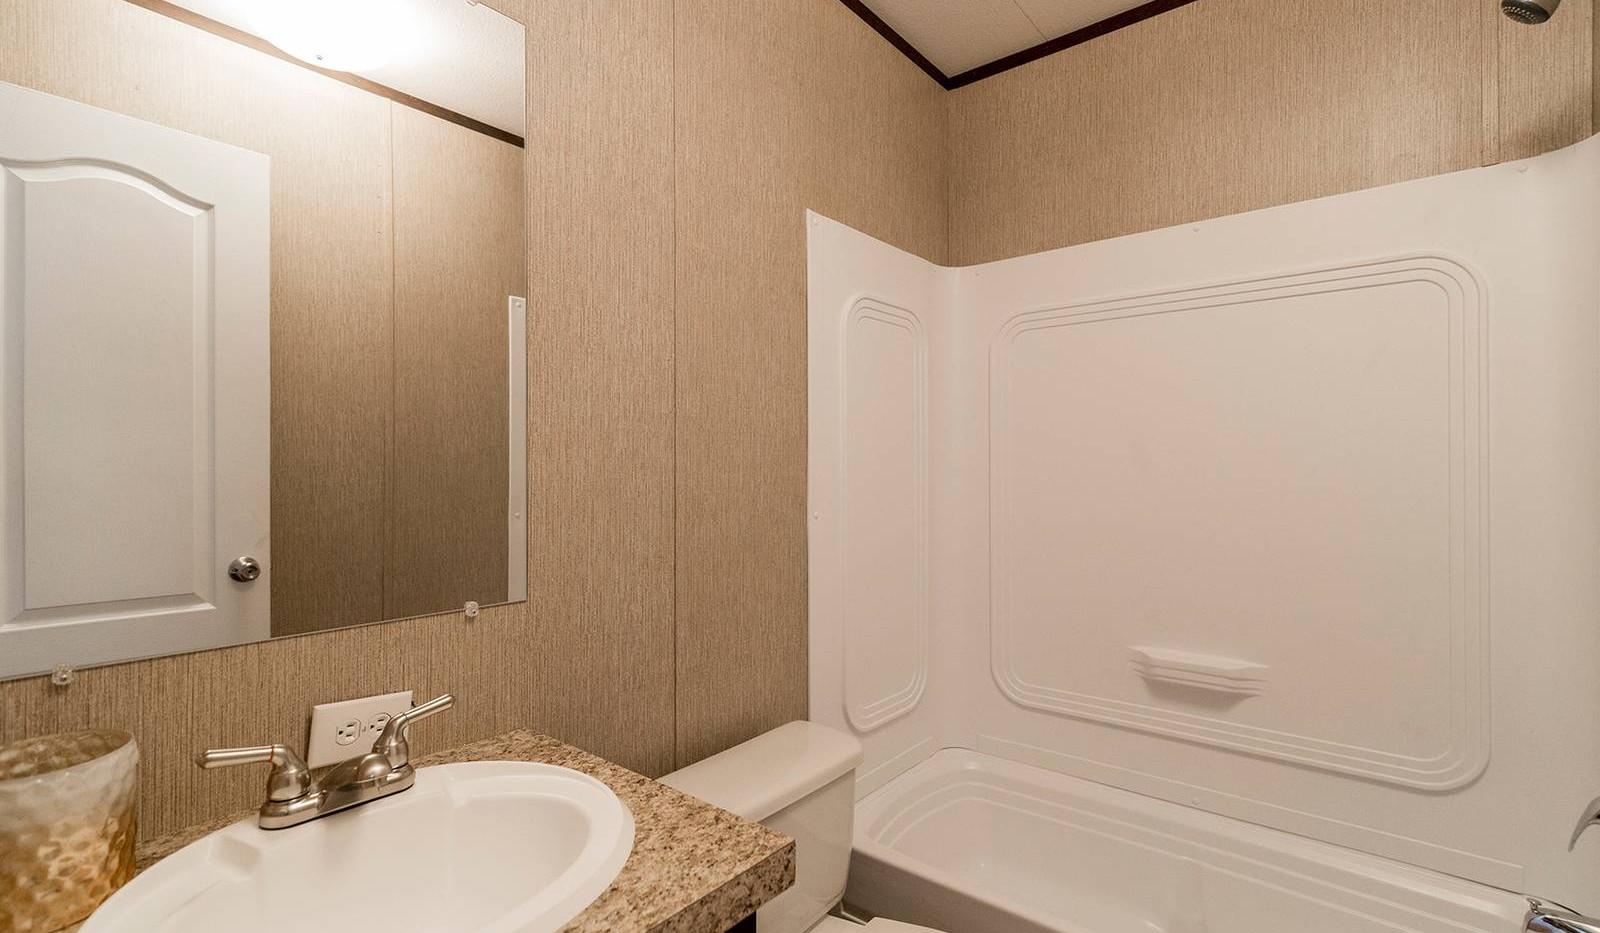 4-redman-1466a-bathroom-1600x1067.jpg